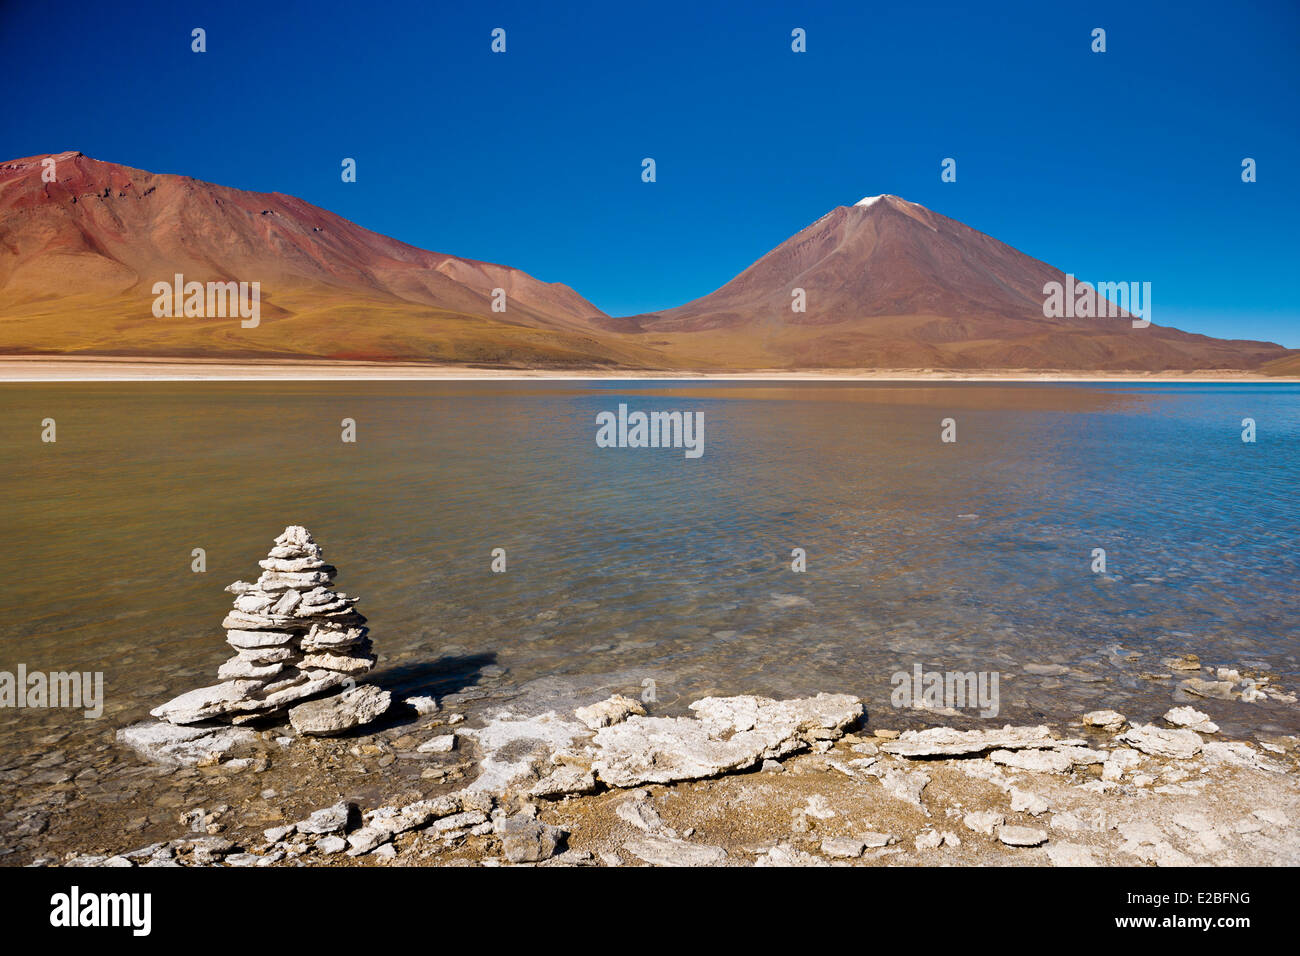 Bolivia, Potosi Department, Sur Lipez Province, Eduardo Avaroa Andean Fauna National Reserve, Licancabur volcano - Stock Image